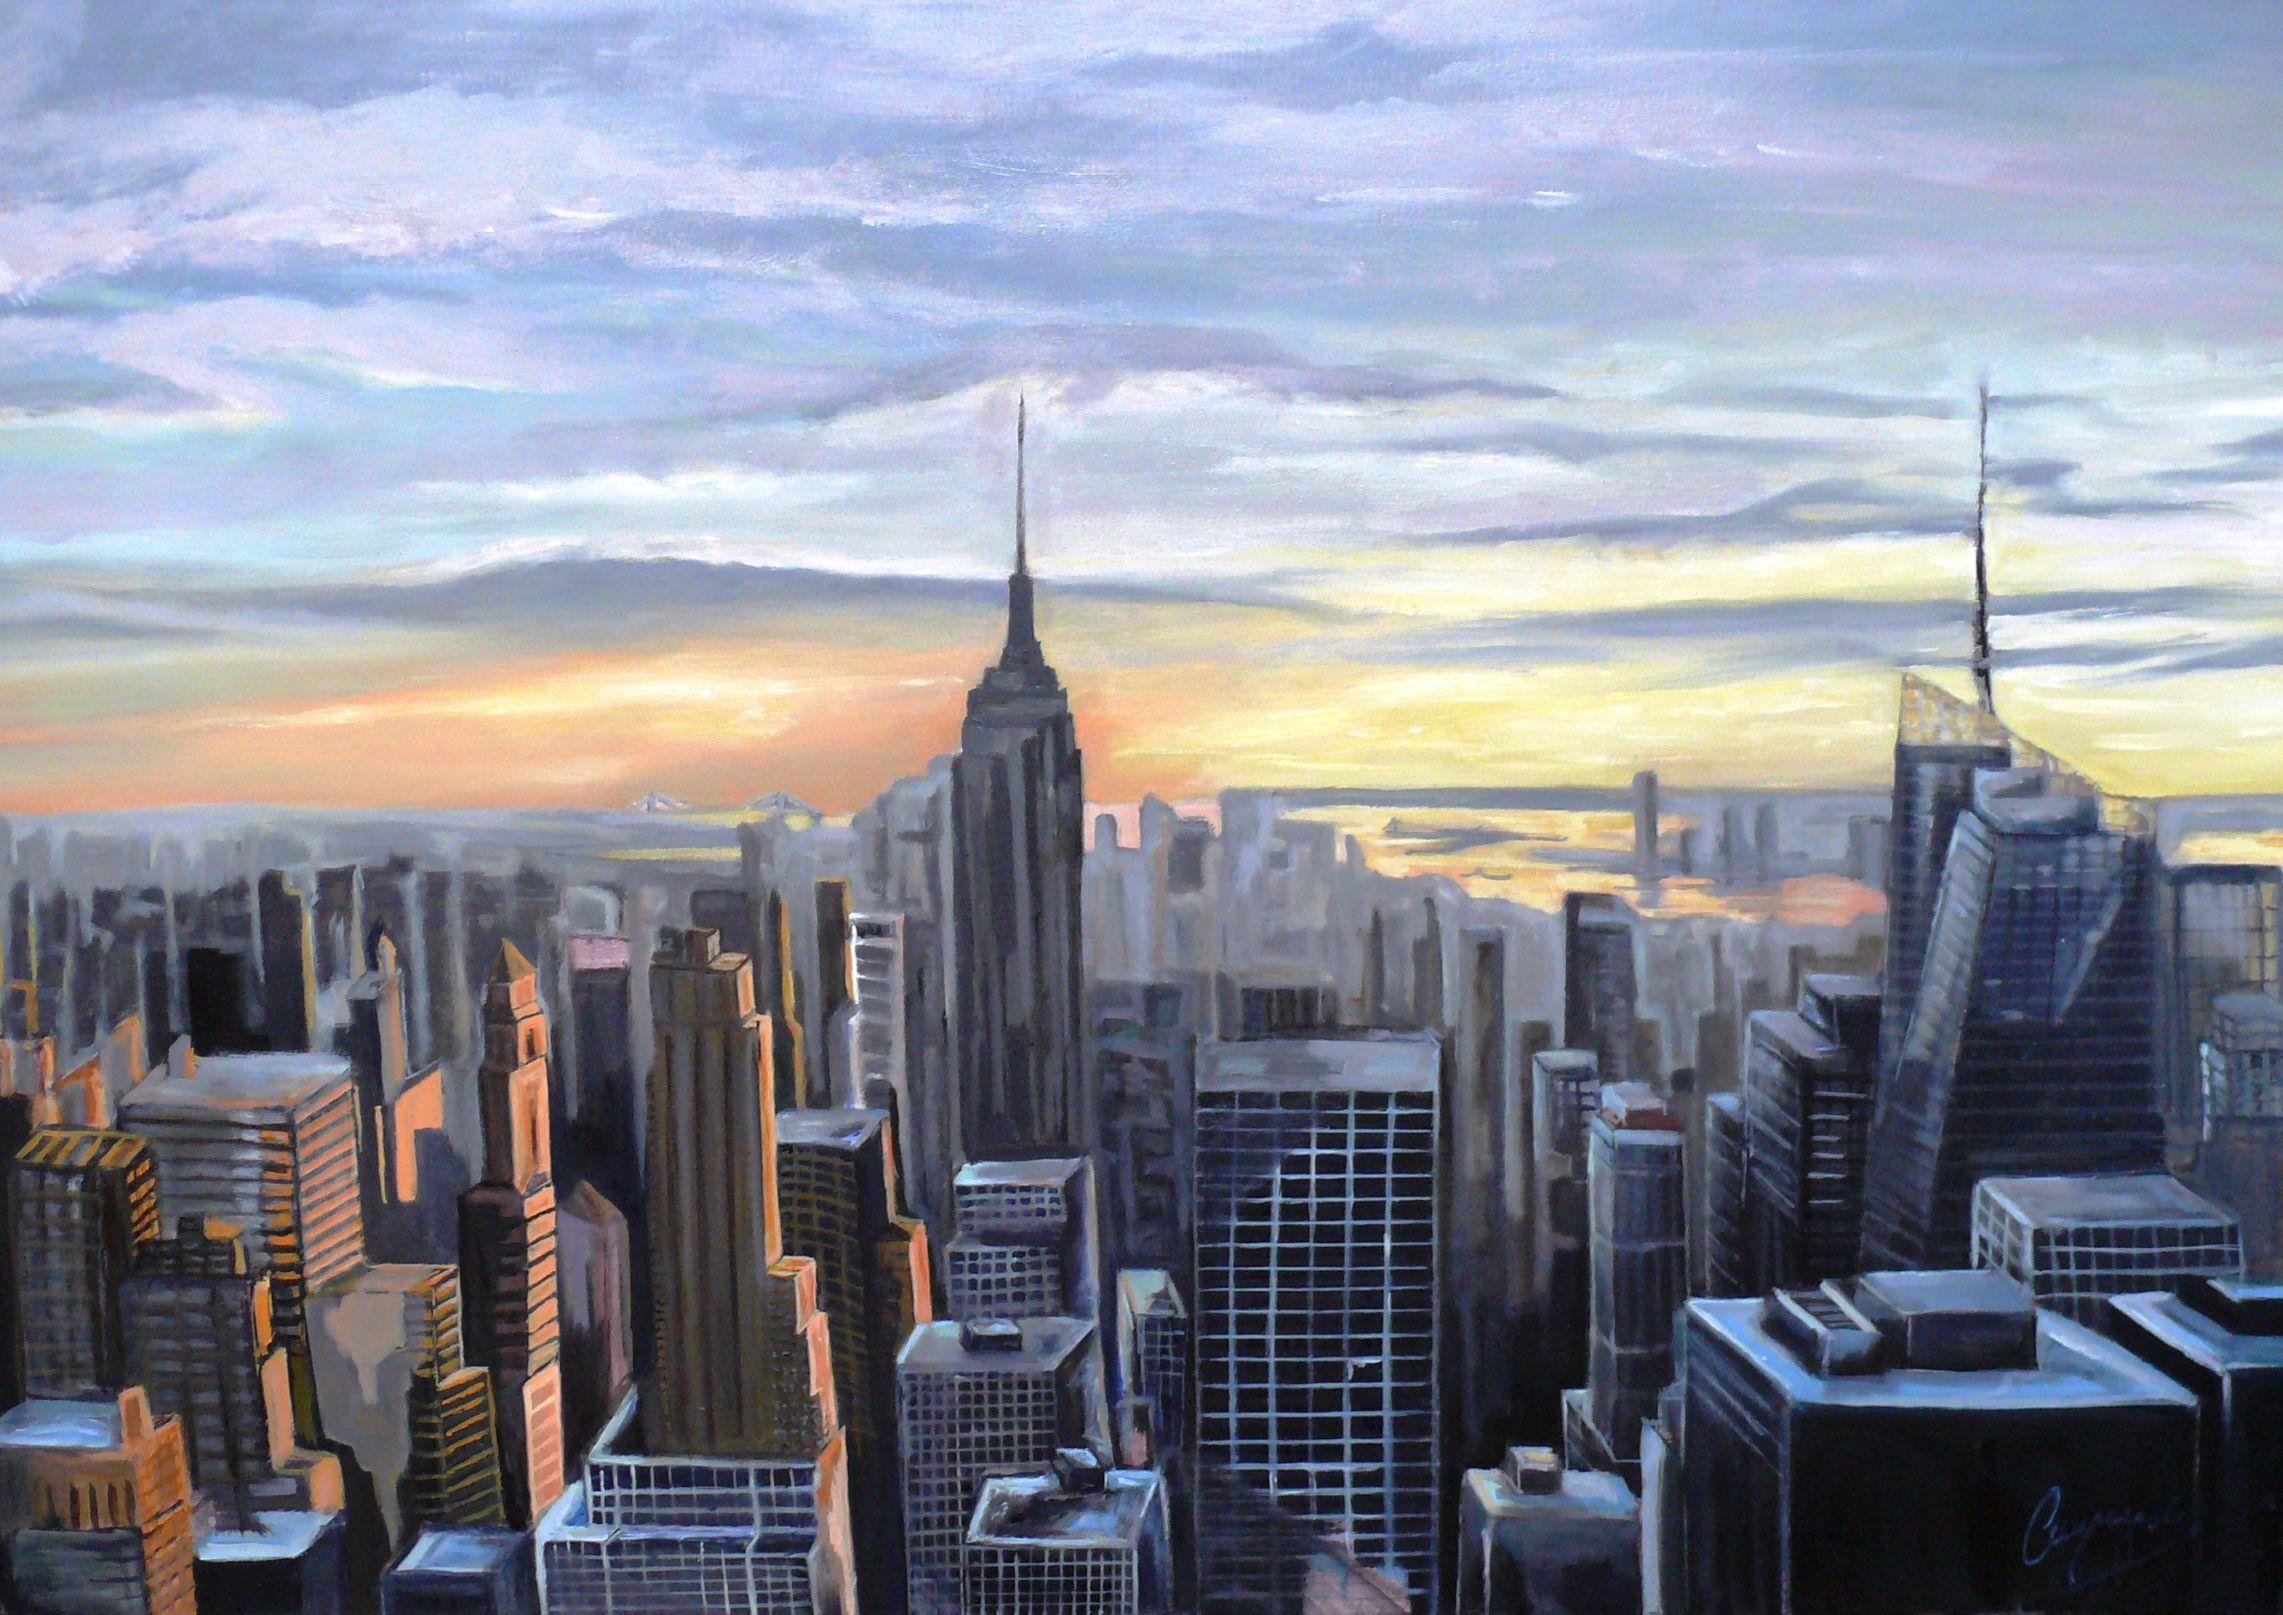 NEW YORK (2015) - Carlos Congregado López